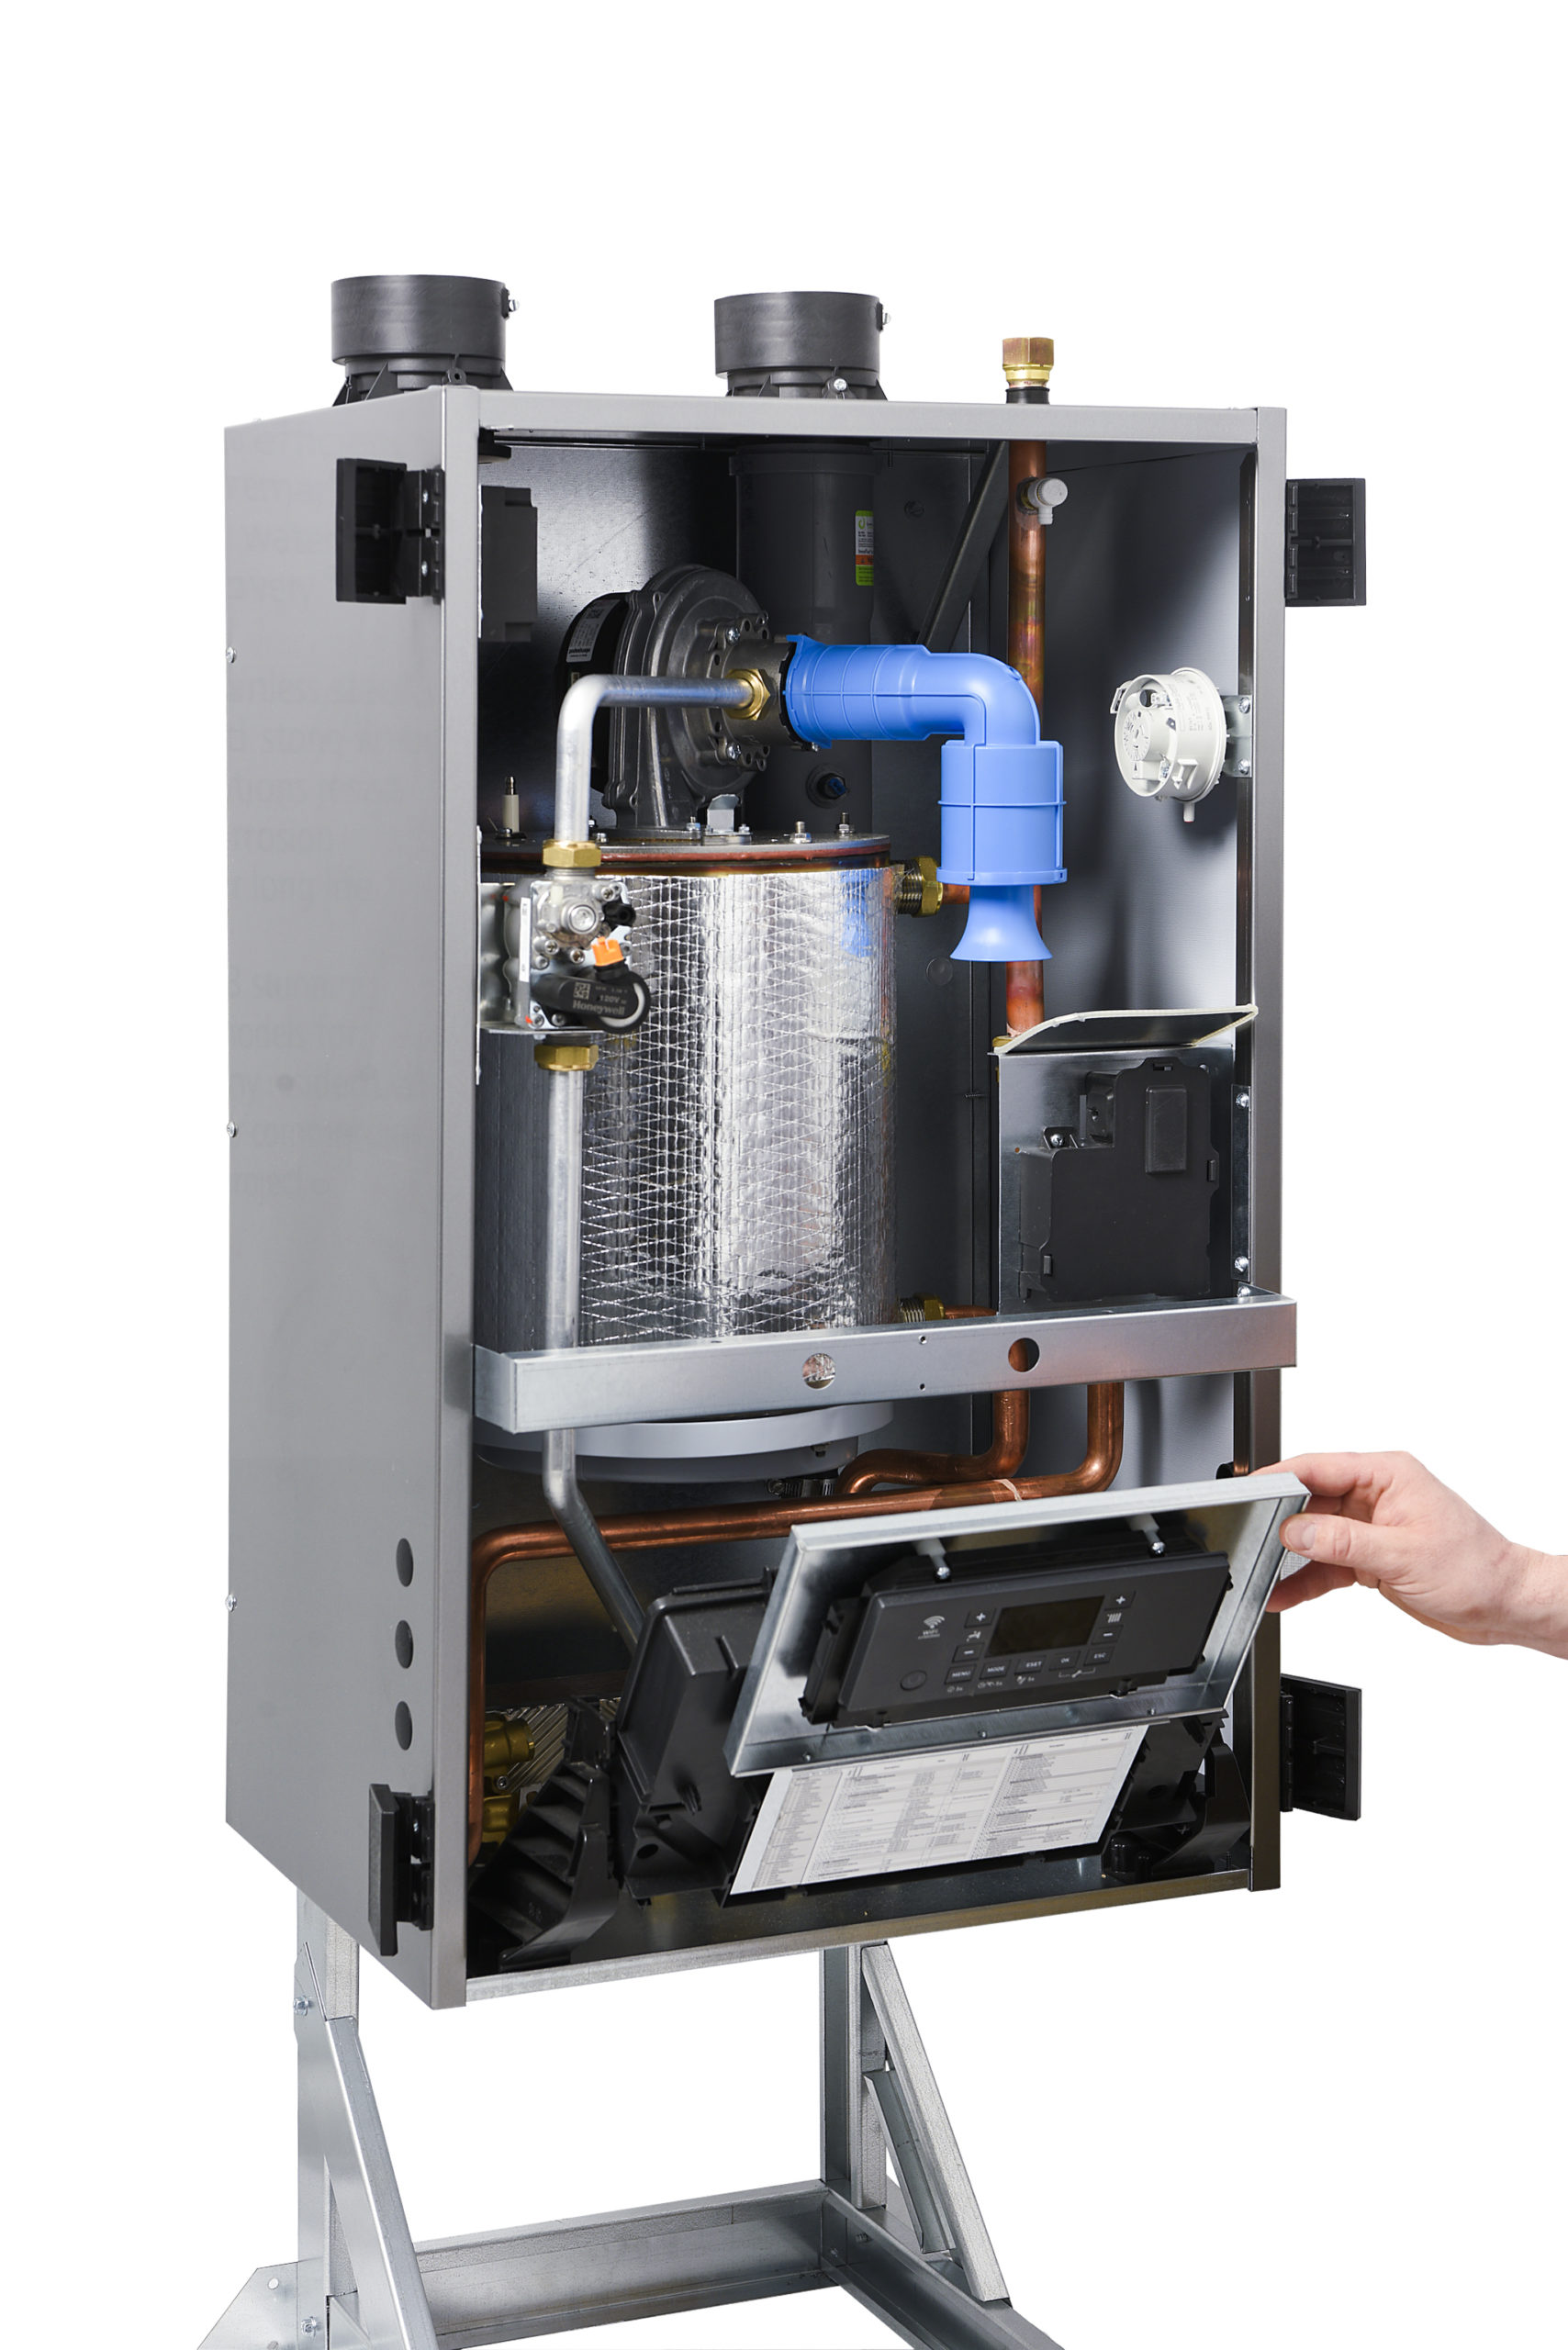 NTI FTVN Boiler Inside View